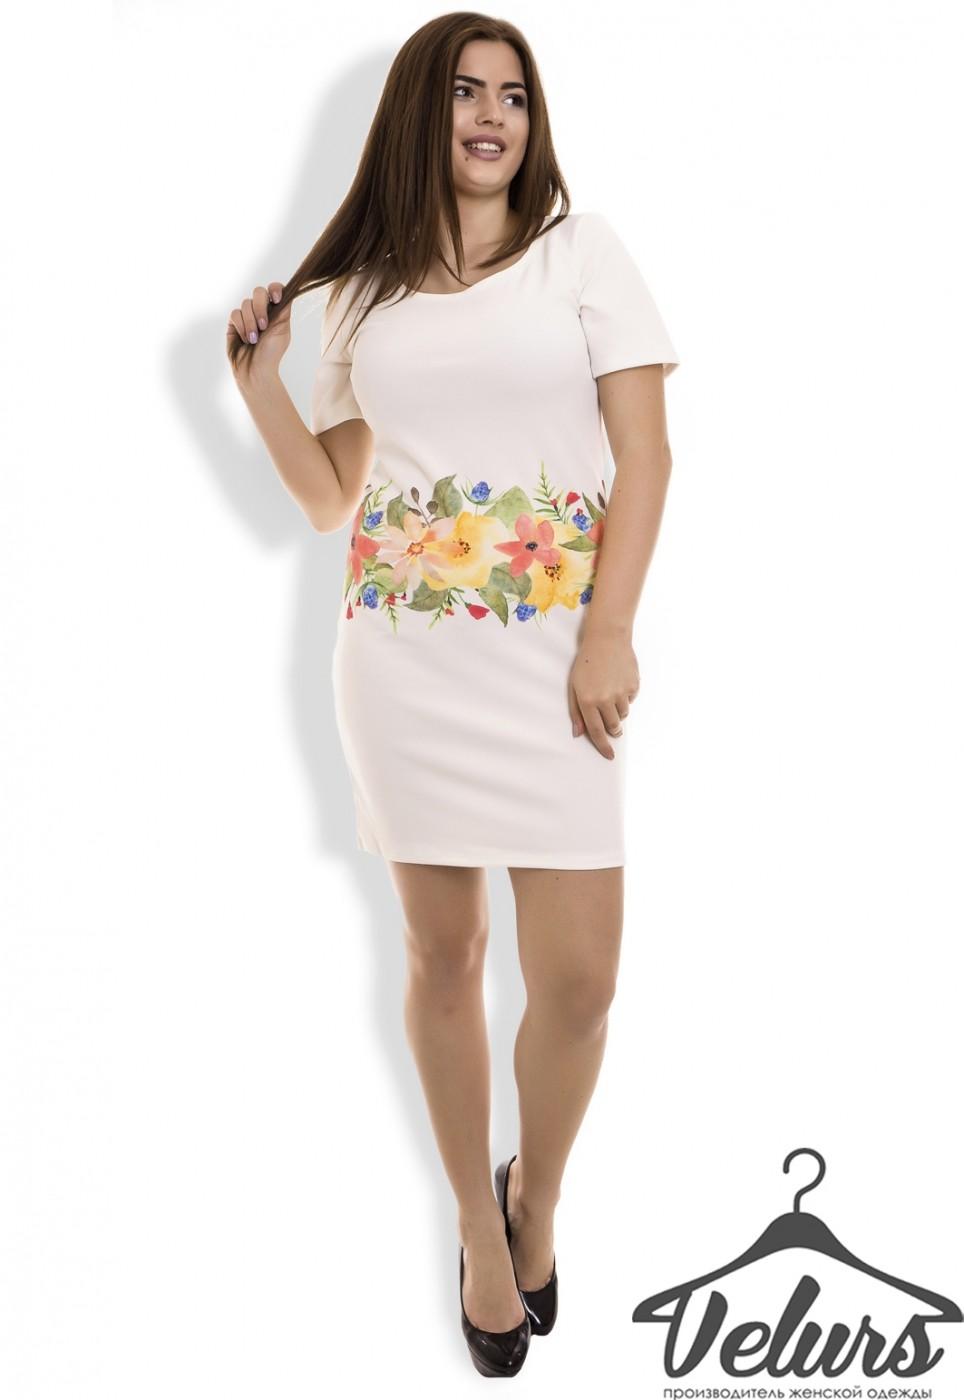 Velurs: Платье 212126 - фото 1